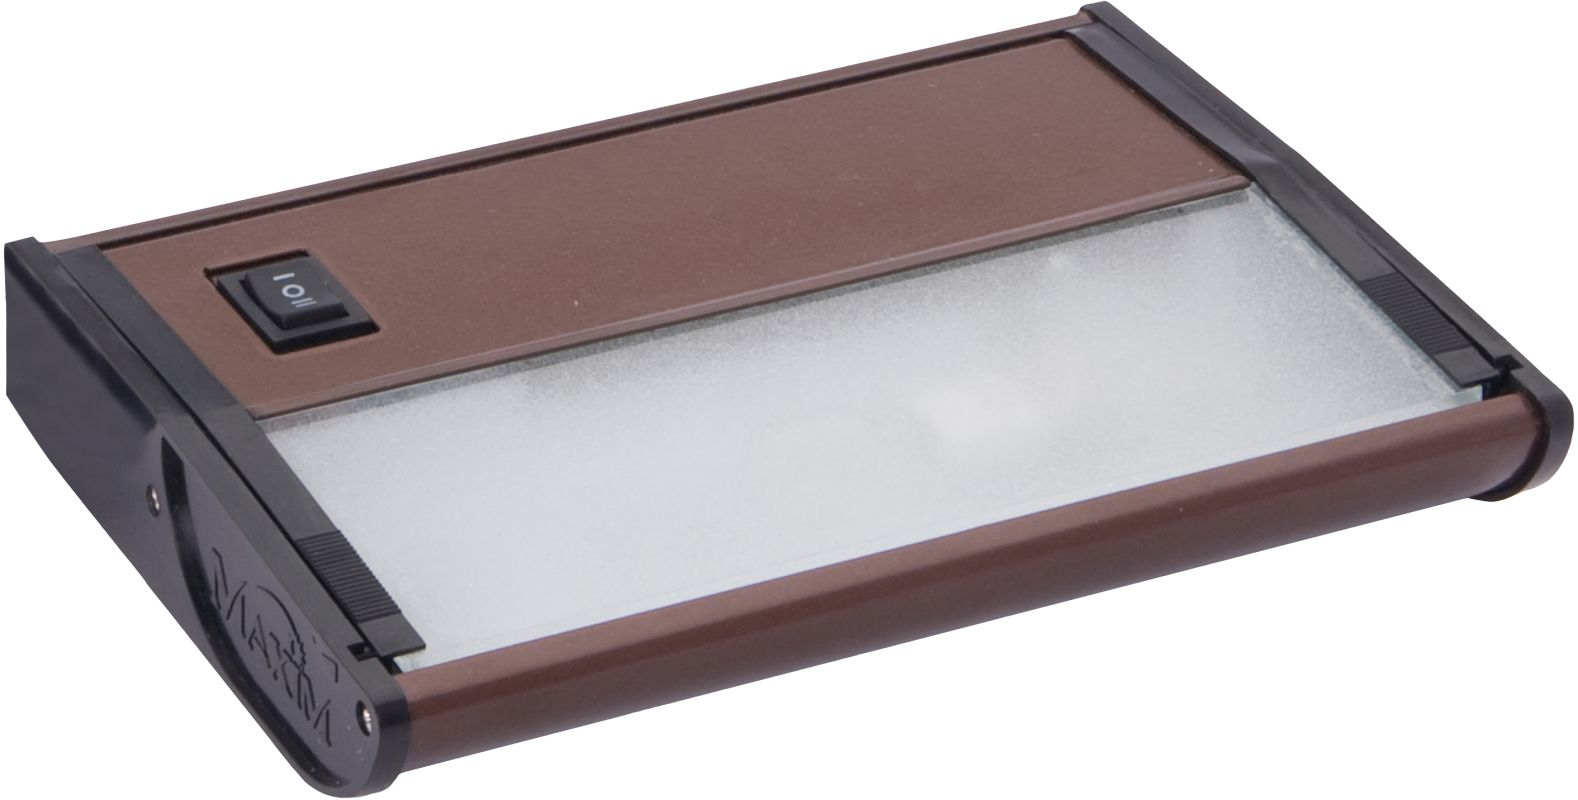 "Maxim 87830 7"" 1 Light Xenon Under Cabinet Light from the CounterMax"